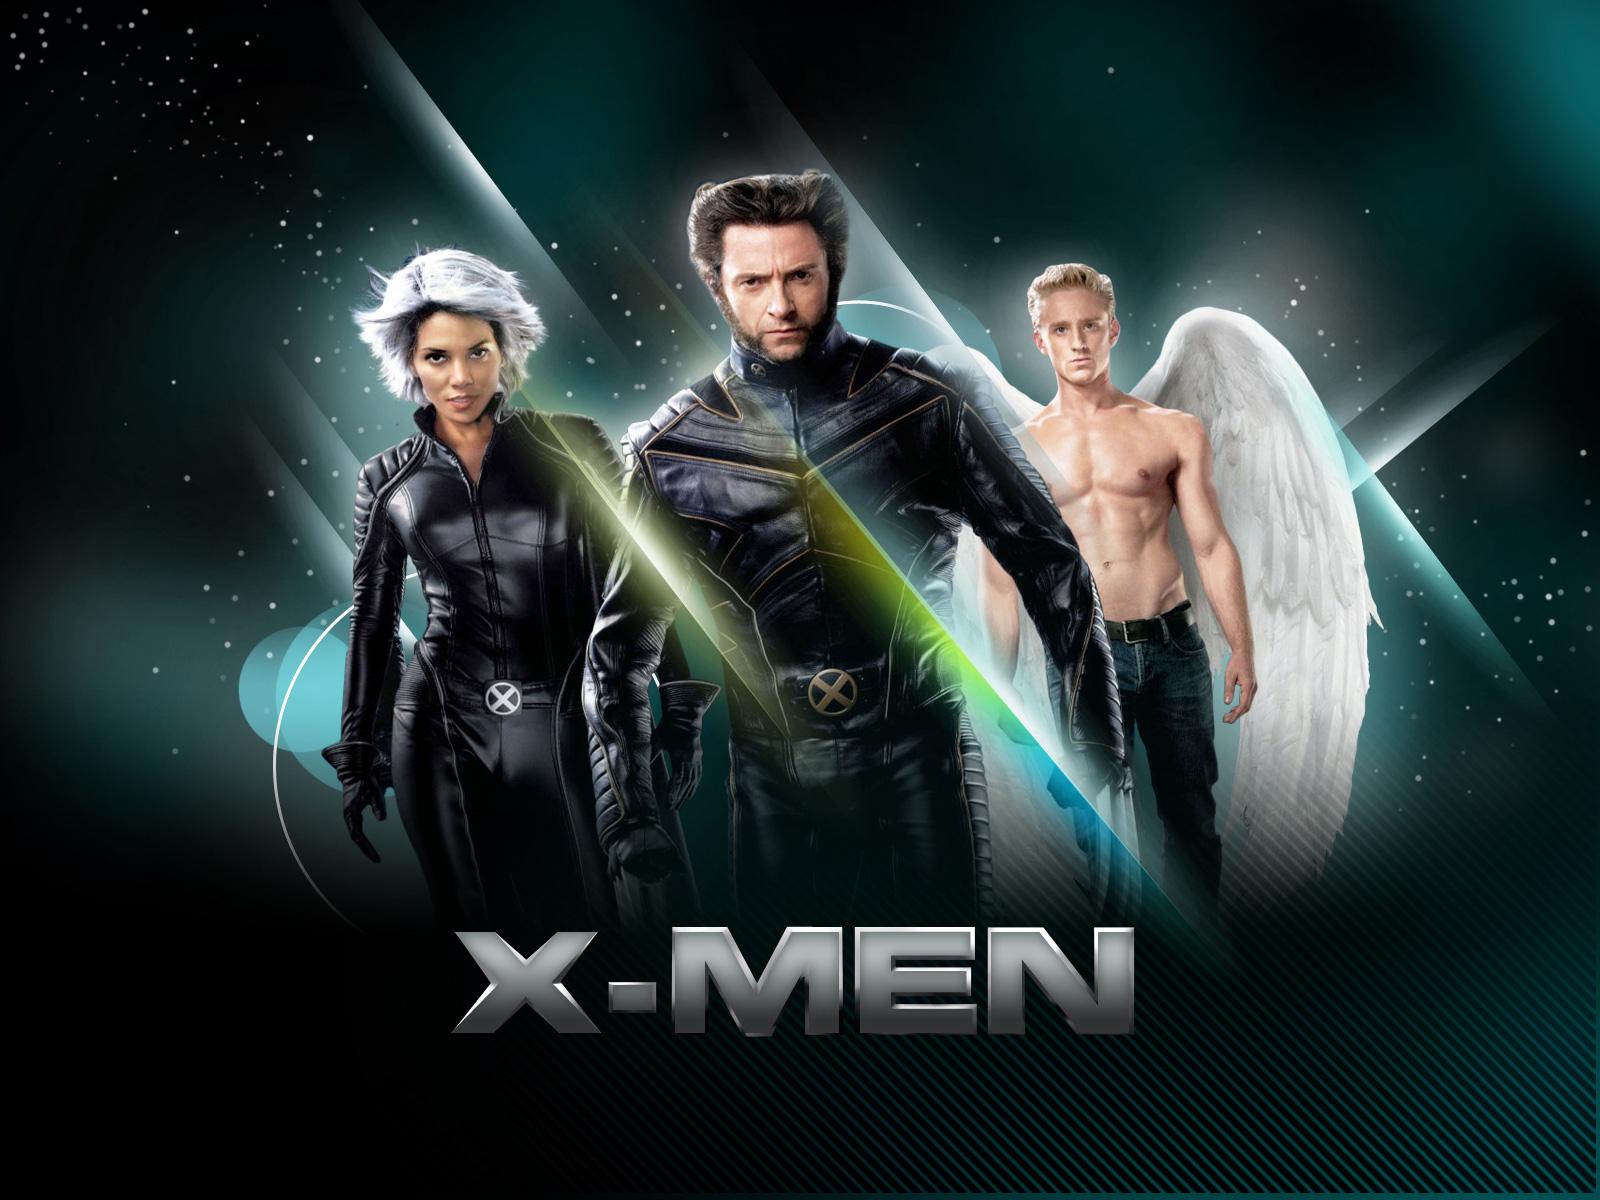 Creating x men movie poster photoshop tutorials agus web design